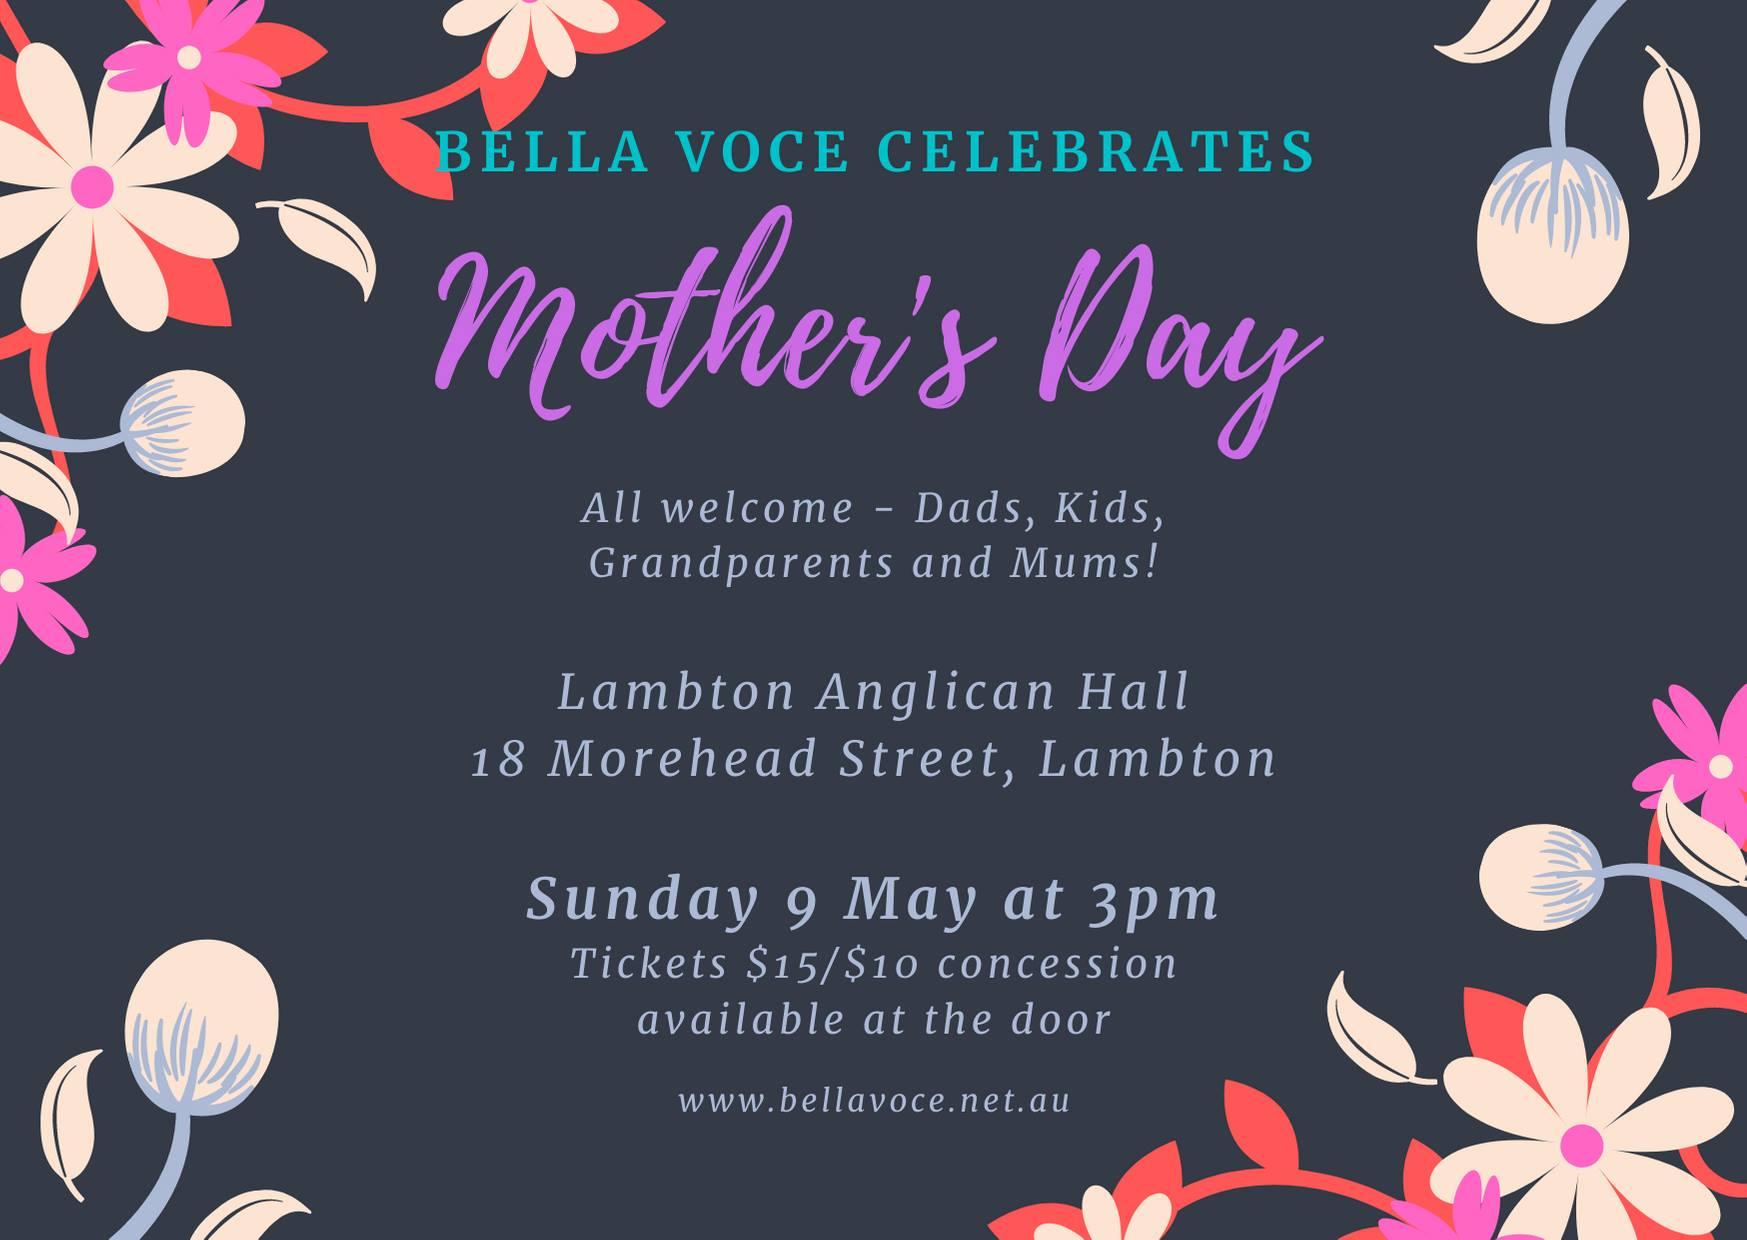 Bella Voce celebrates Mother's Day